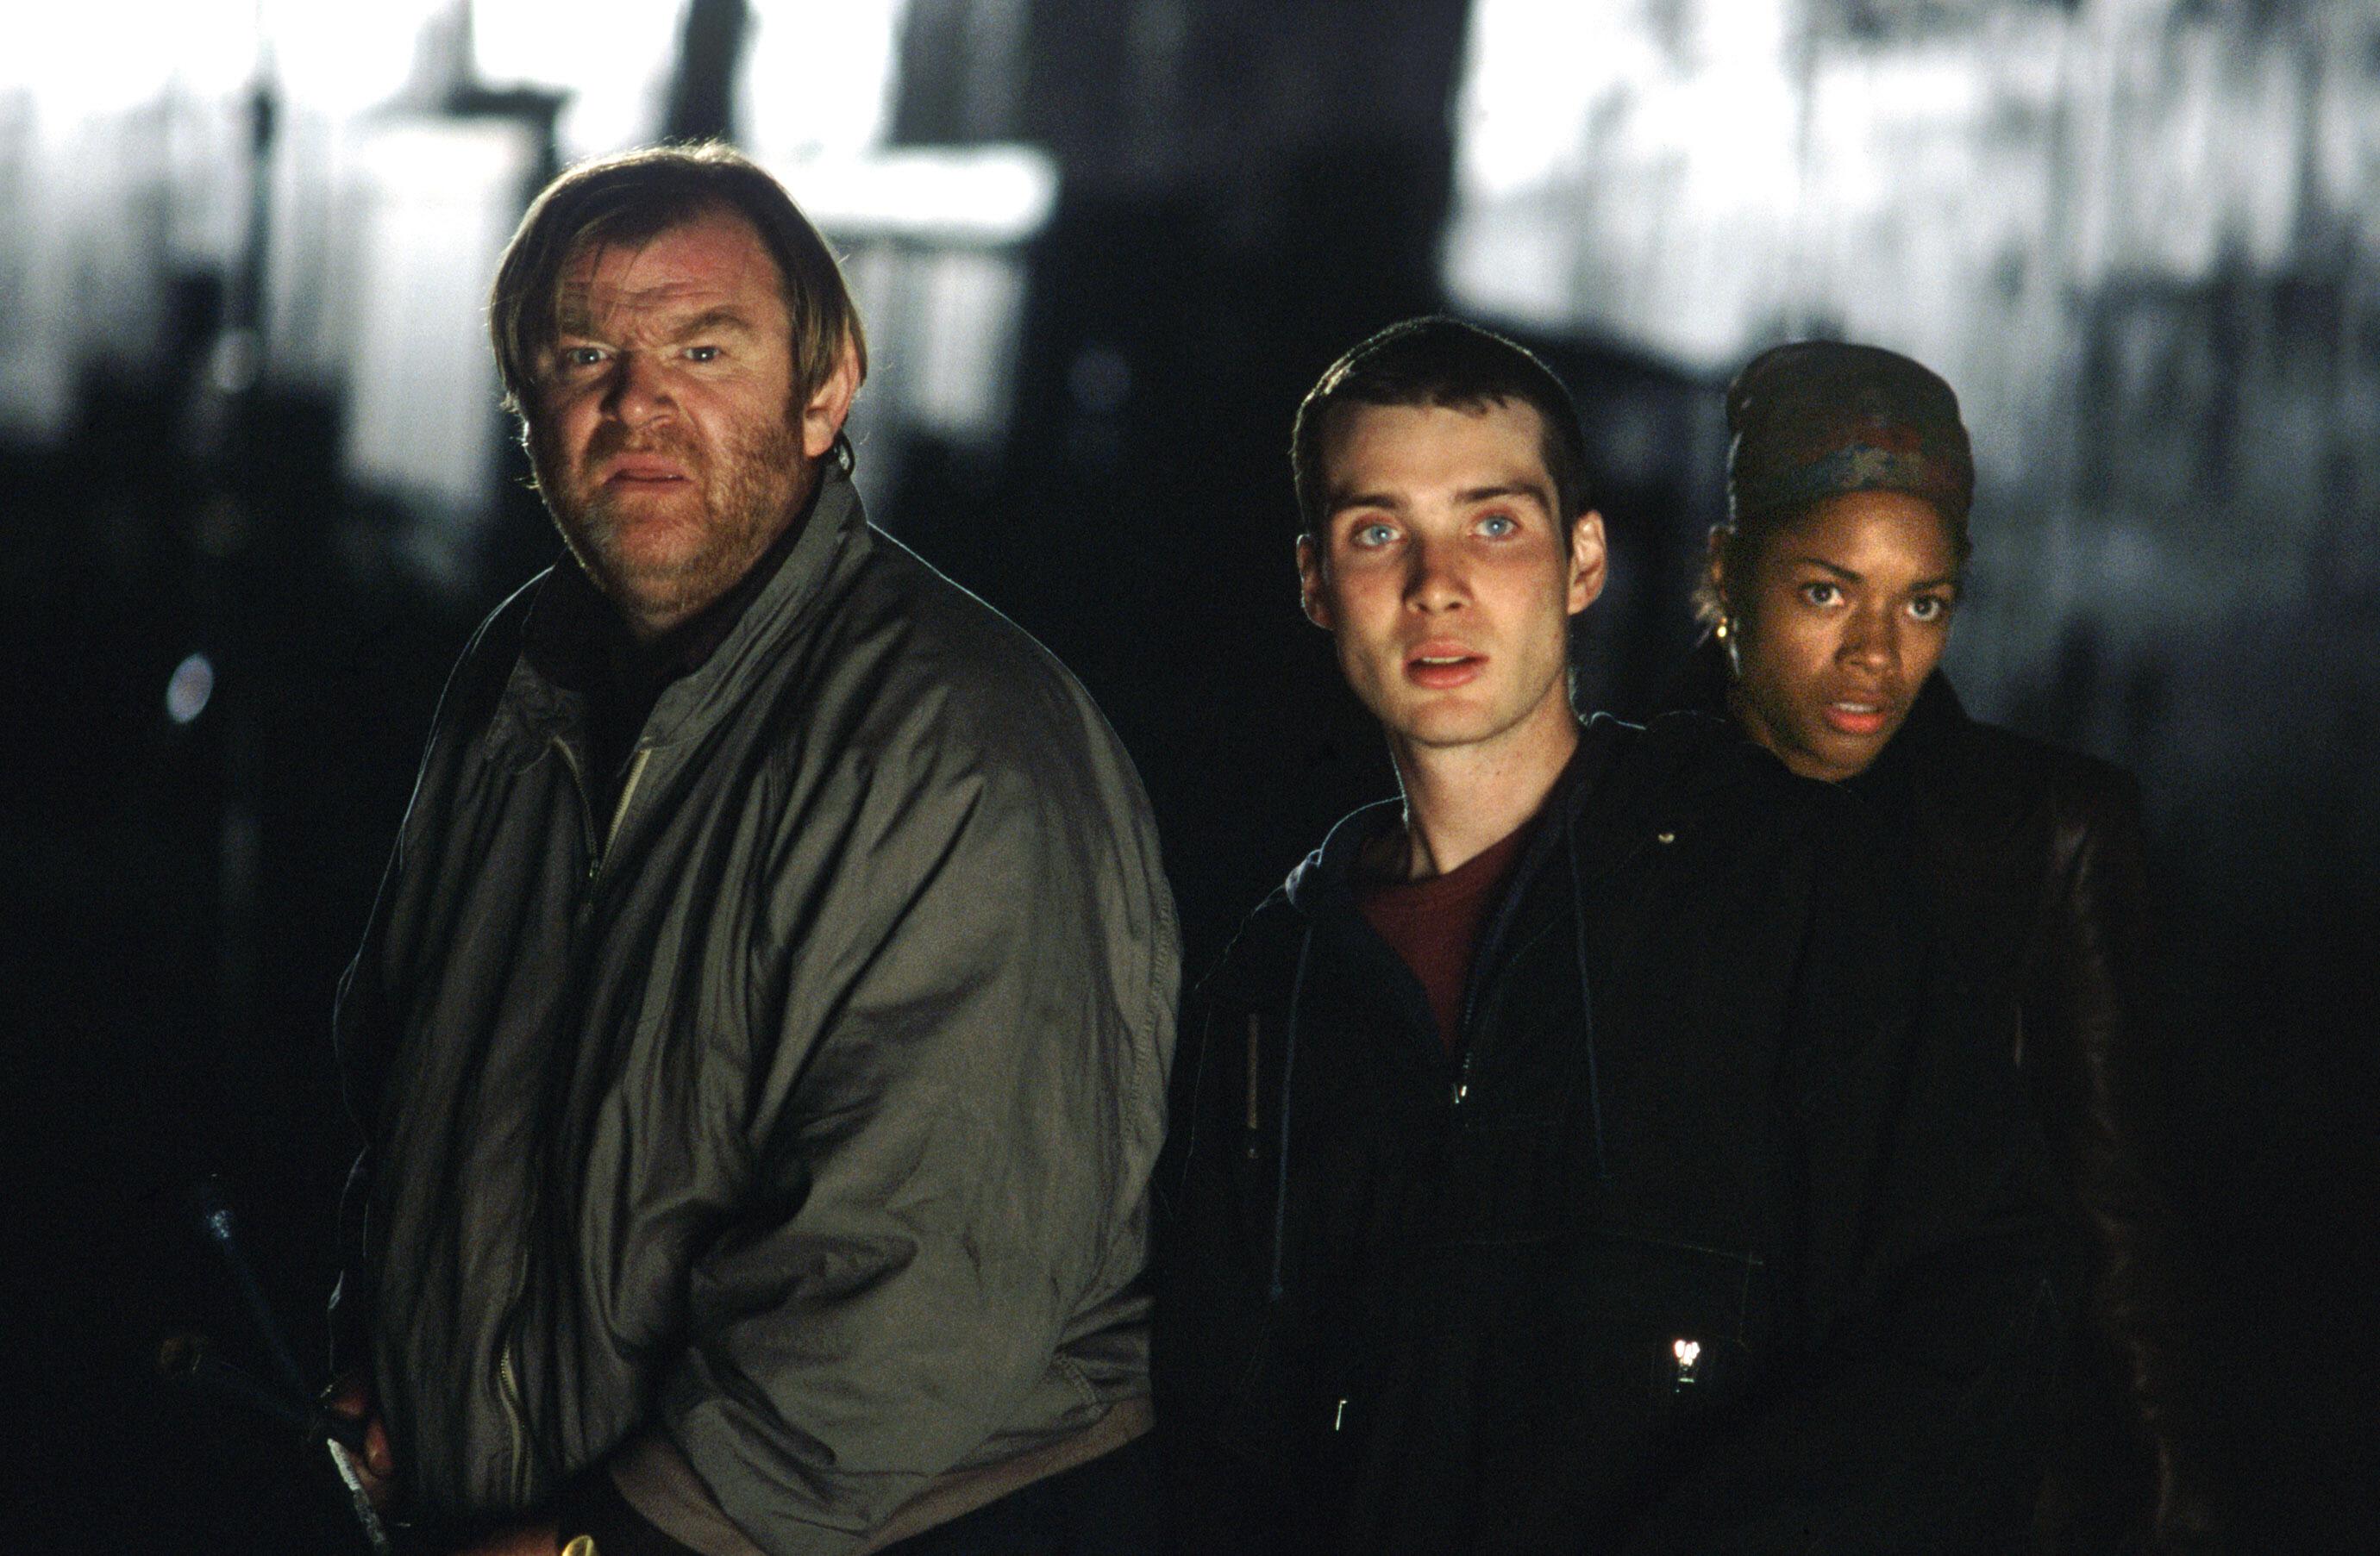 28 DAYS LATER, Brendan Gleeson, Cillian Murphy, Naomie Harris, 2002, TM & Copyright (c) 20th Century Fox Film Corp. All rights reserved.